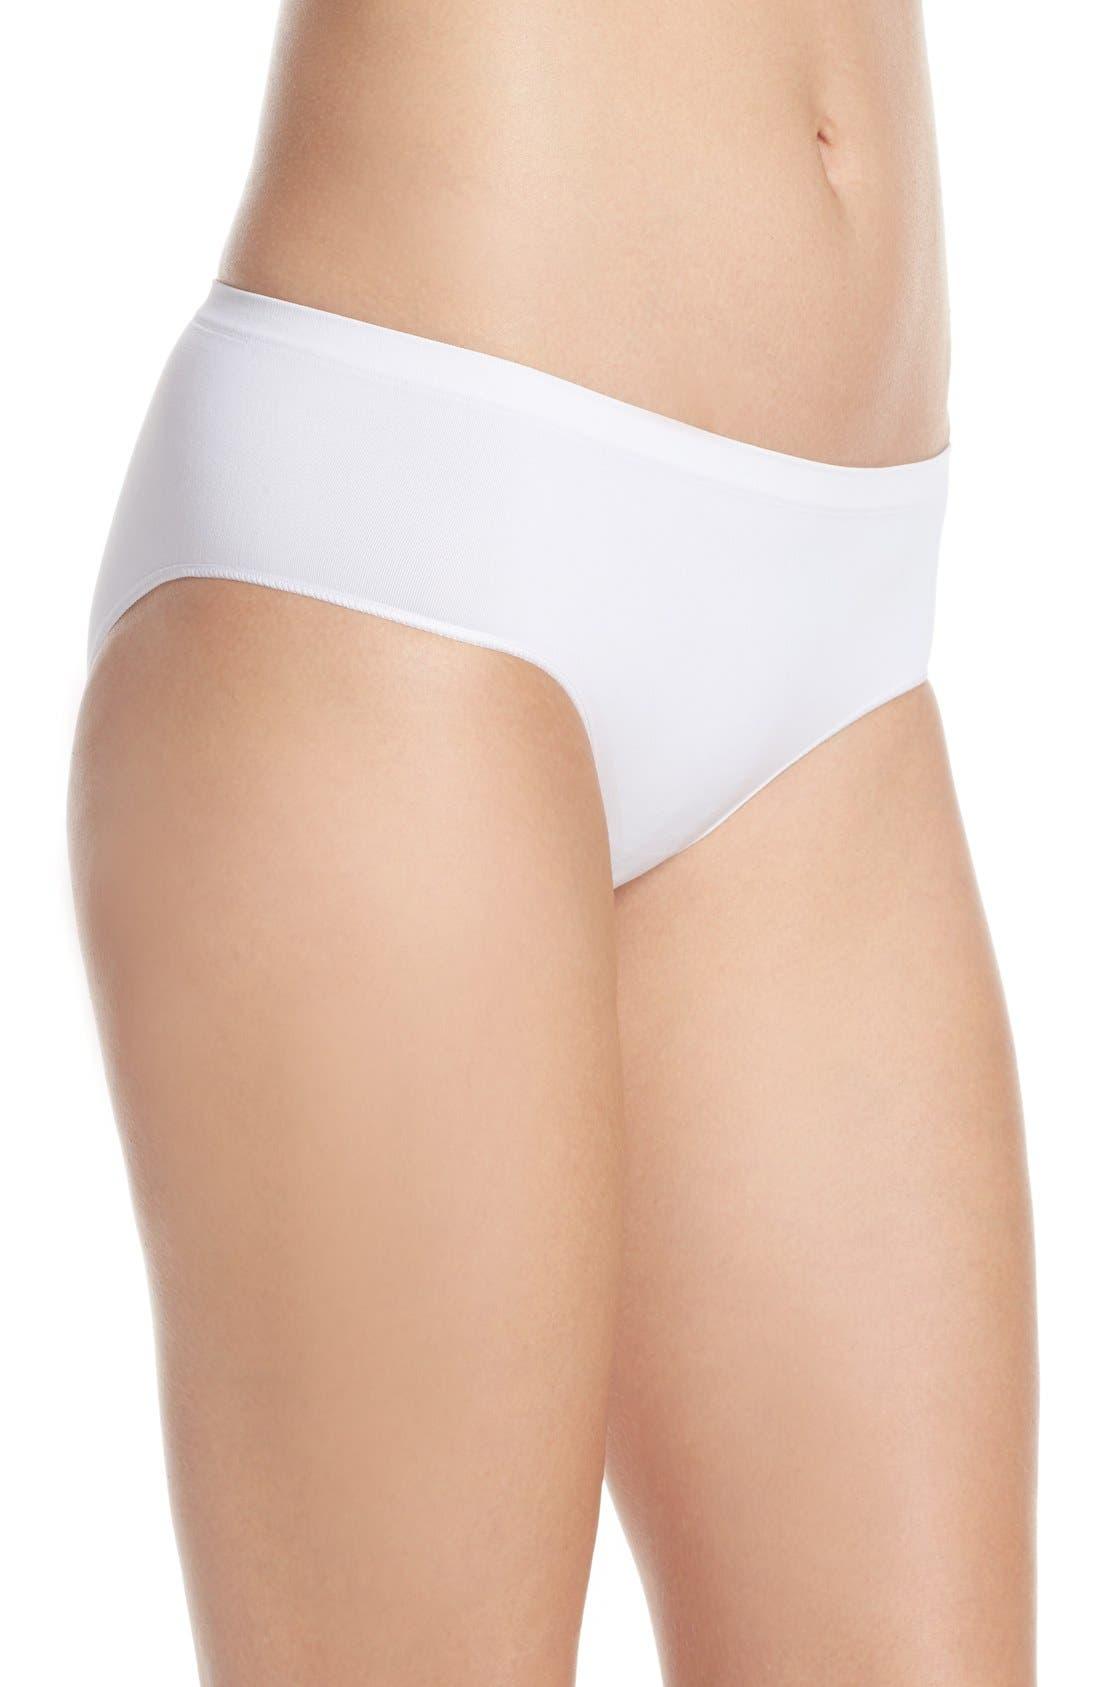 Alternate Image 3  - Nordstrom Lingerie Seamless Hipster Panties (3 for $33)